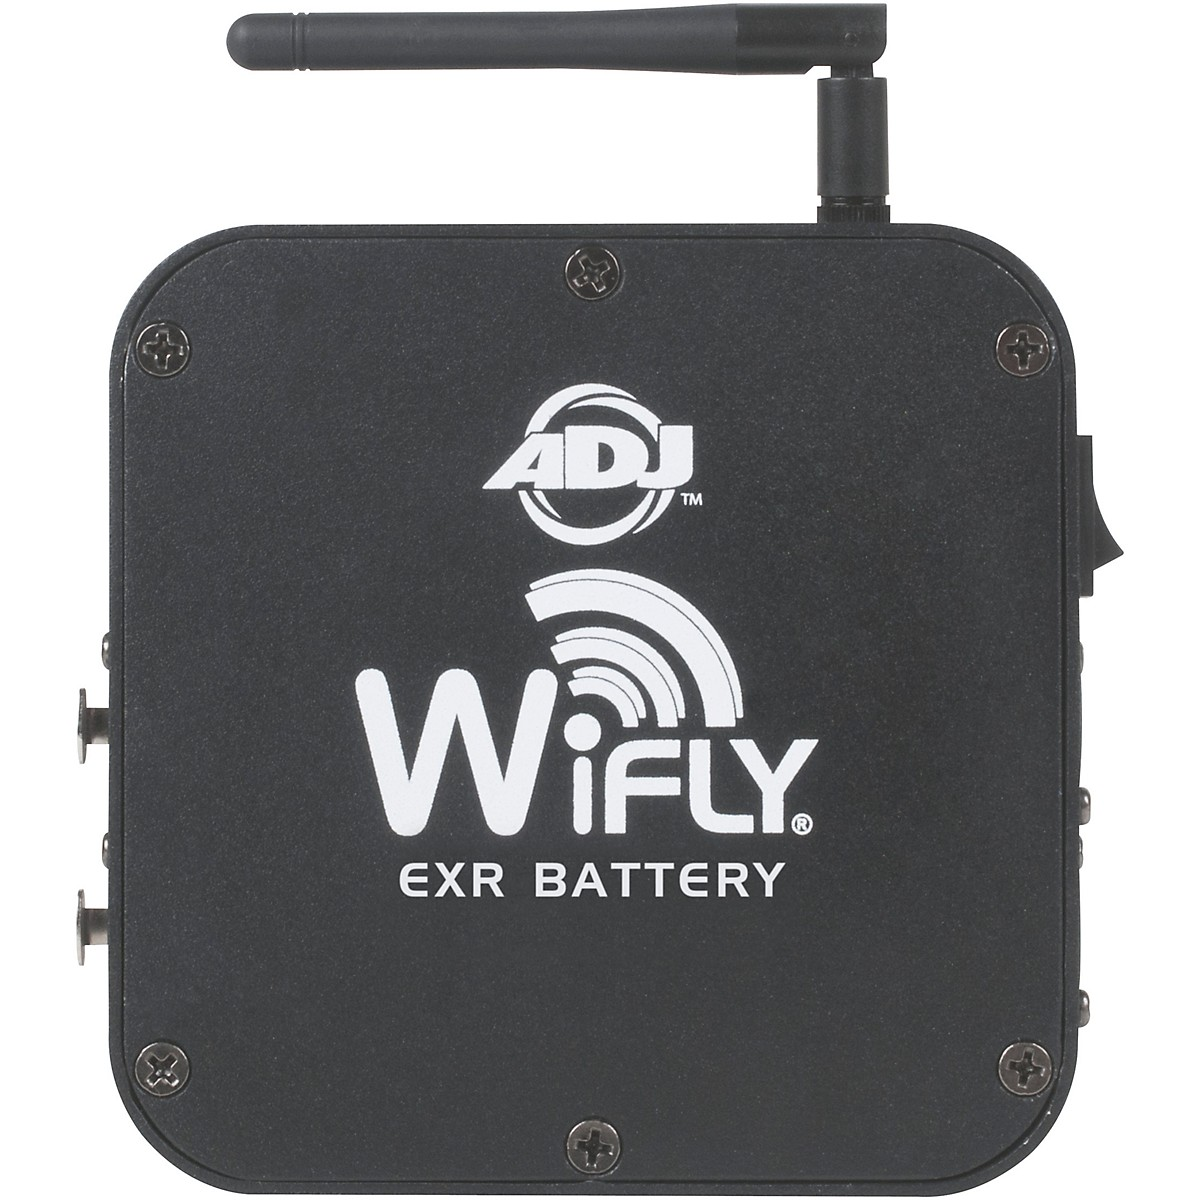 21st Century Publications Wifly EXR Battery DMX Transceiver